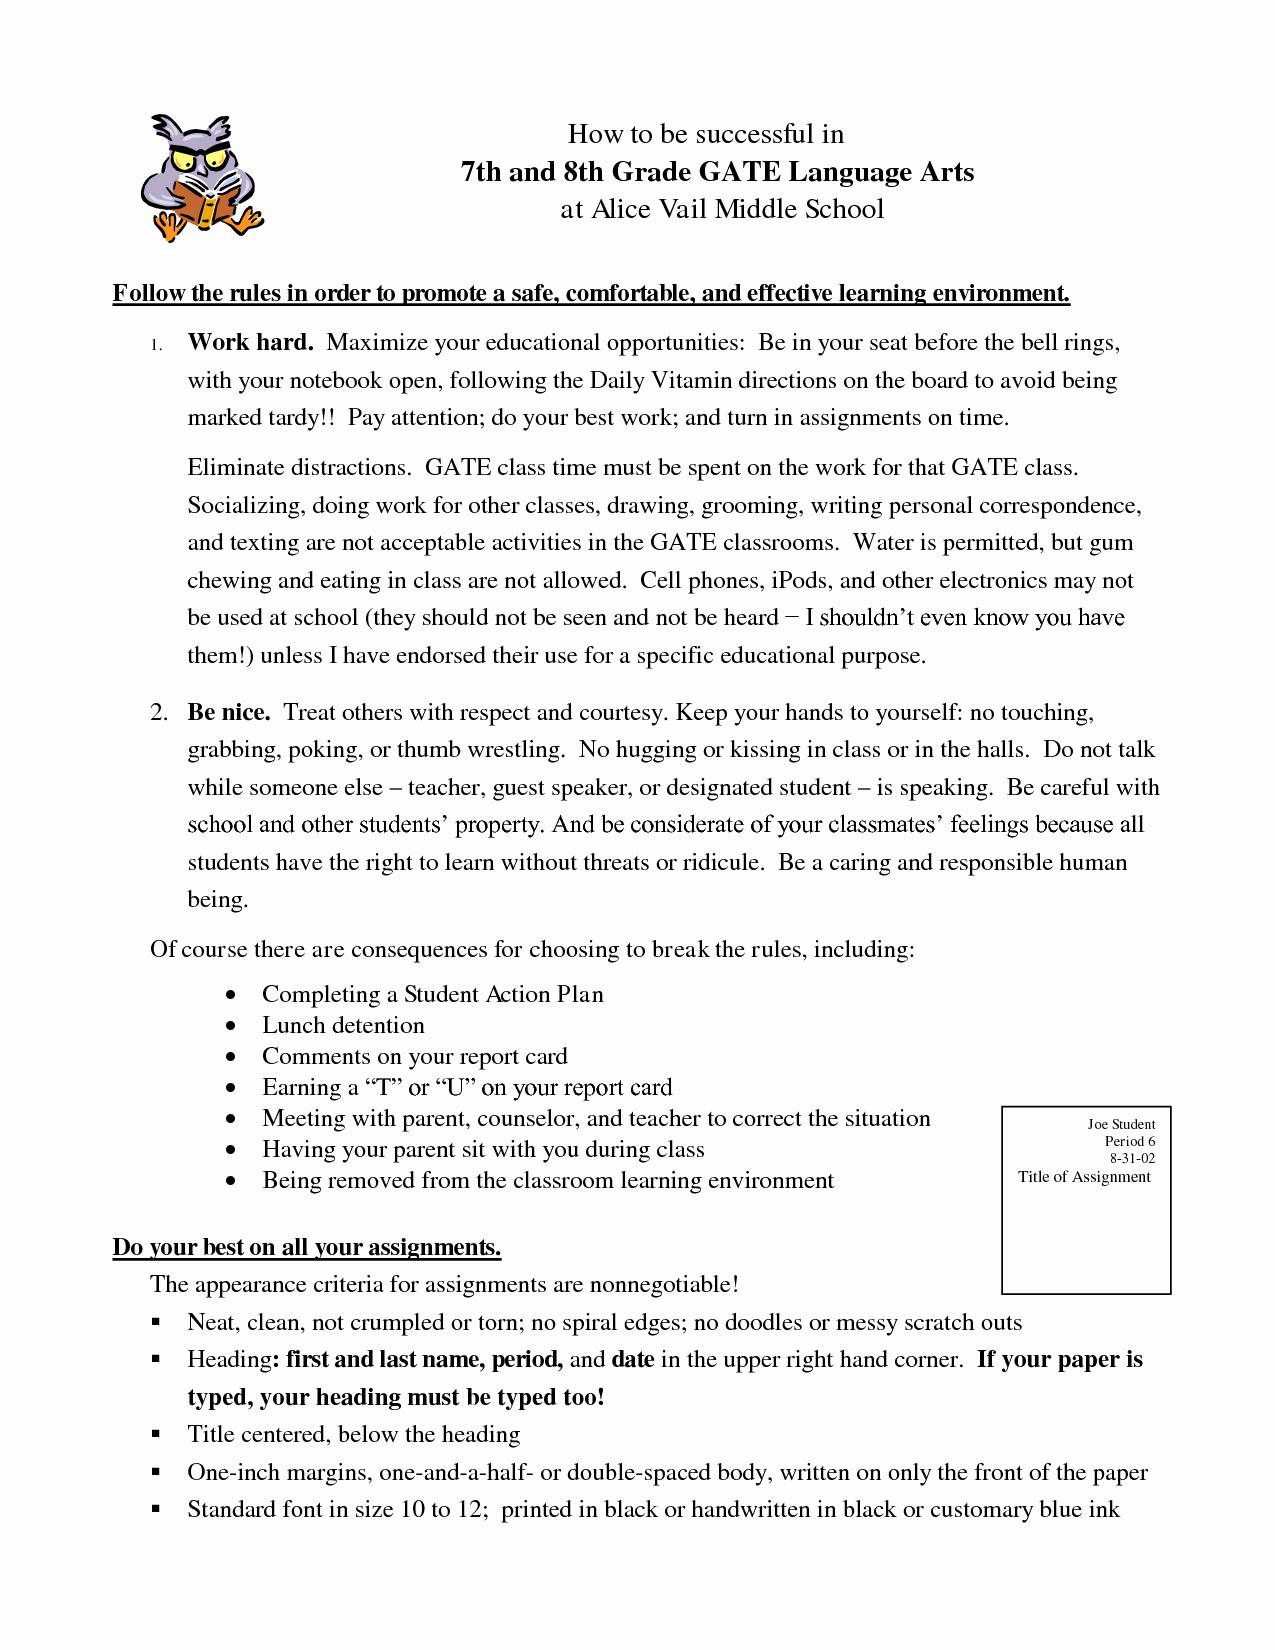 Language Arts Worksheets 8th Grade Unique 8th Grade Language Arts Worksheets – Mreichert Kids Worksheets